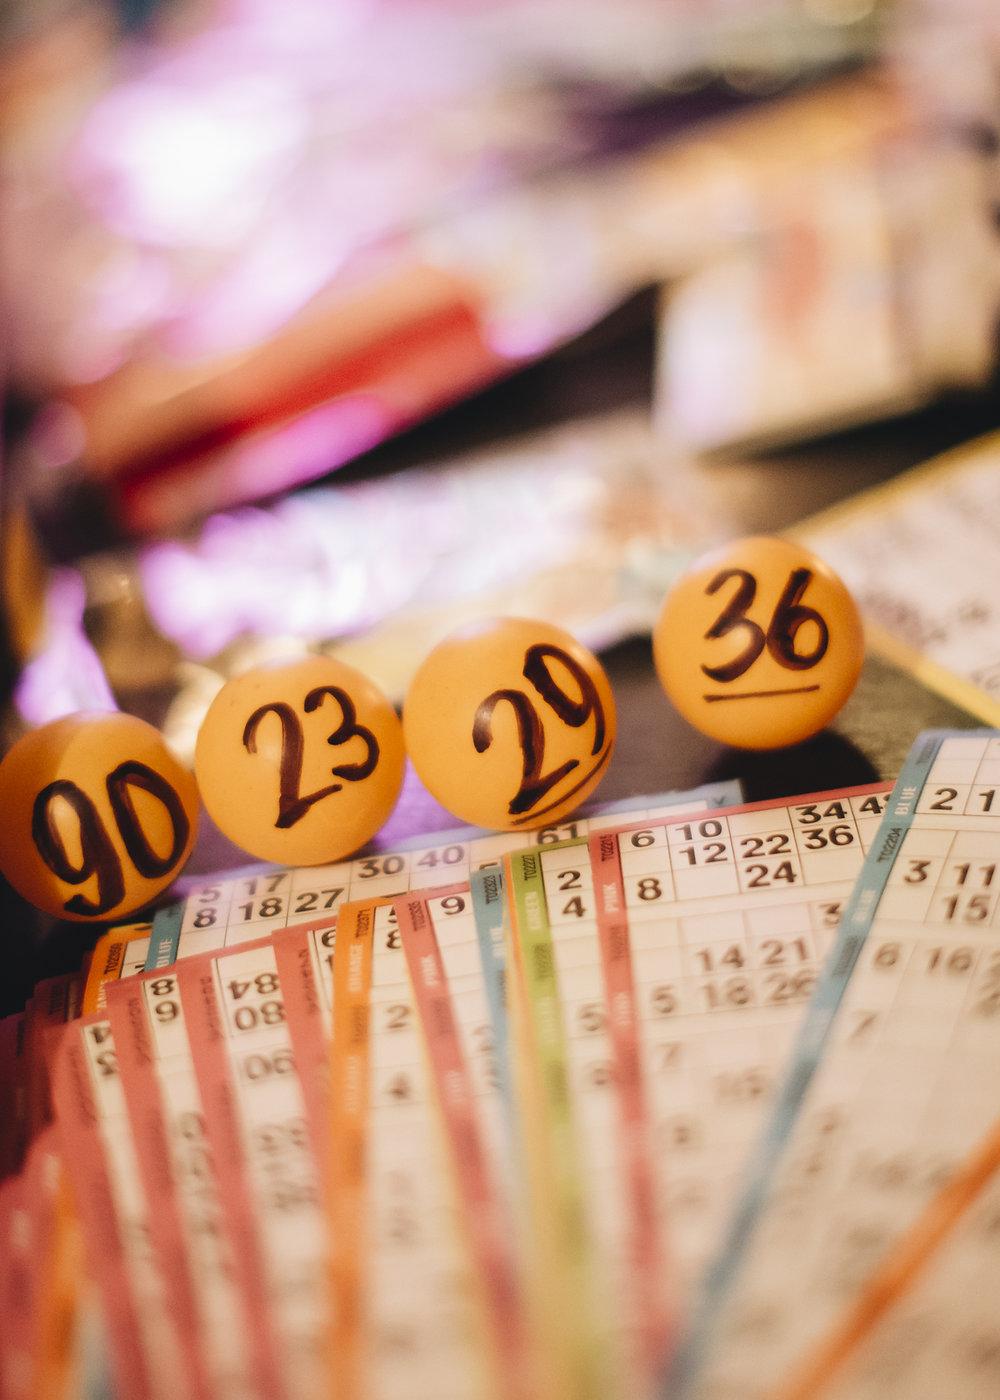 company trivia, corporate bingo, free bingo melbourne, bingo, bingo company, bingo events, bingo fundraiser, bingo melbourne, bingo trivia, corporate events melbourne, free trivia, fundraising events melbournecompany trivia, corporate bingo, free bingo melbourne, bingo, bingo company, bingo events, bingo fundraiser, bingo melbourne, bingo trivia, corporate events melbourne, free trivia, fundraising events melbourne